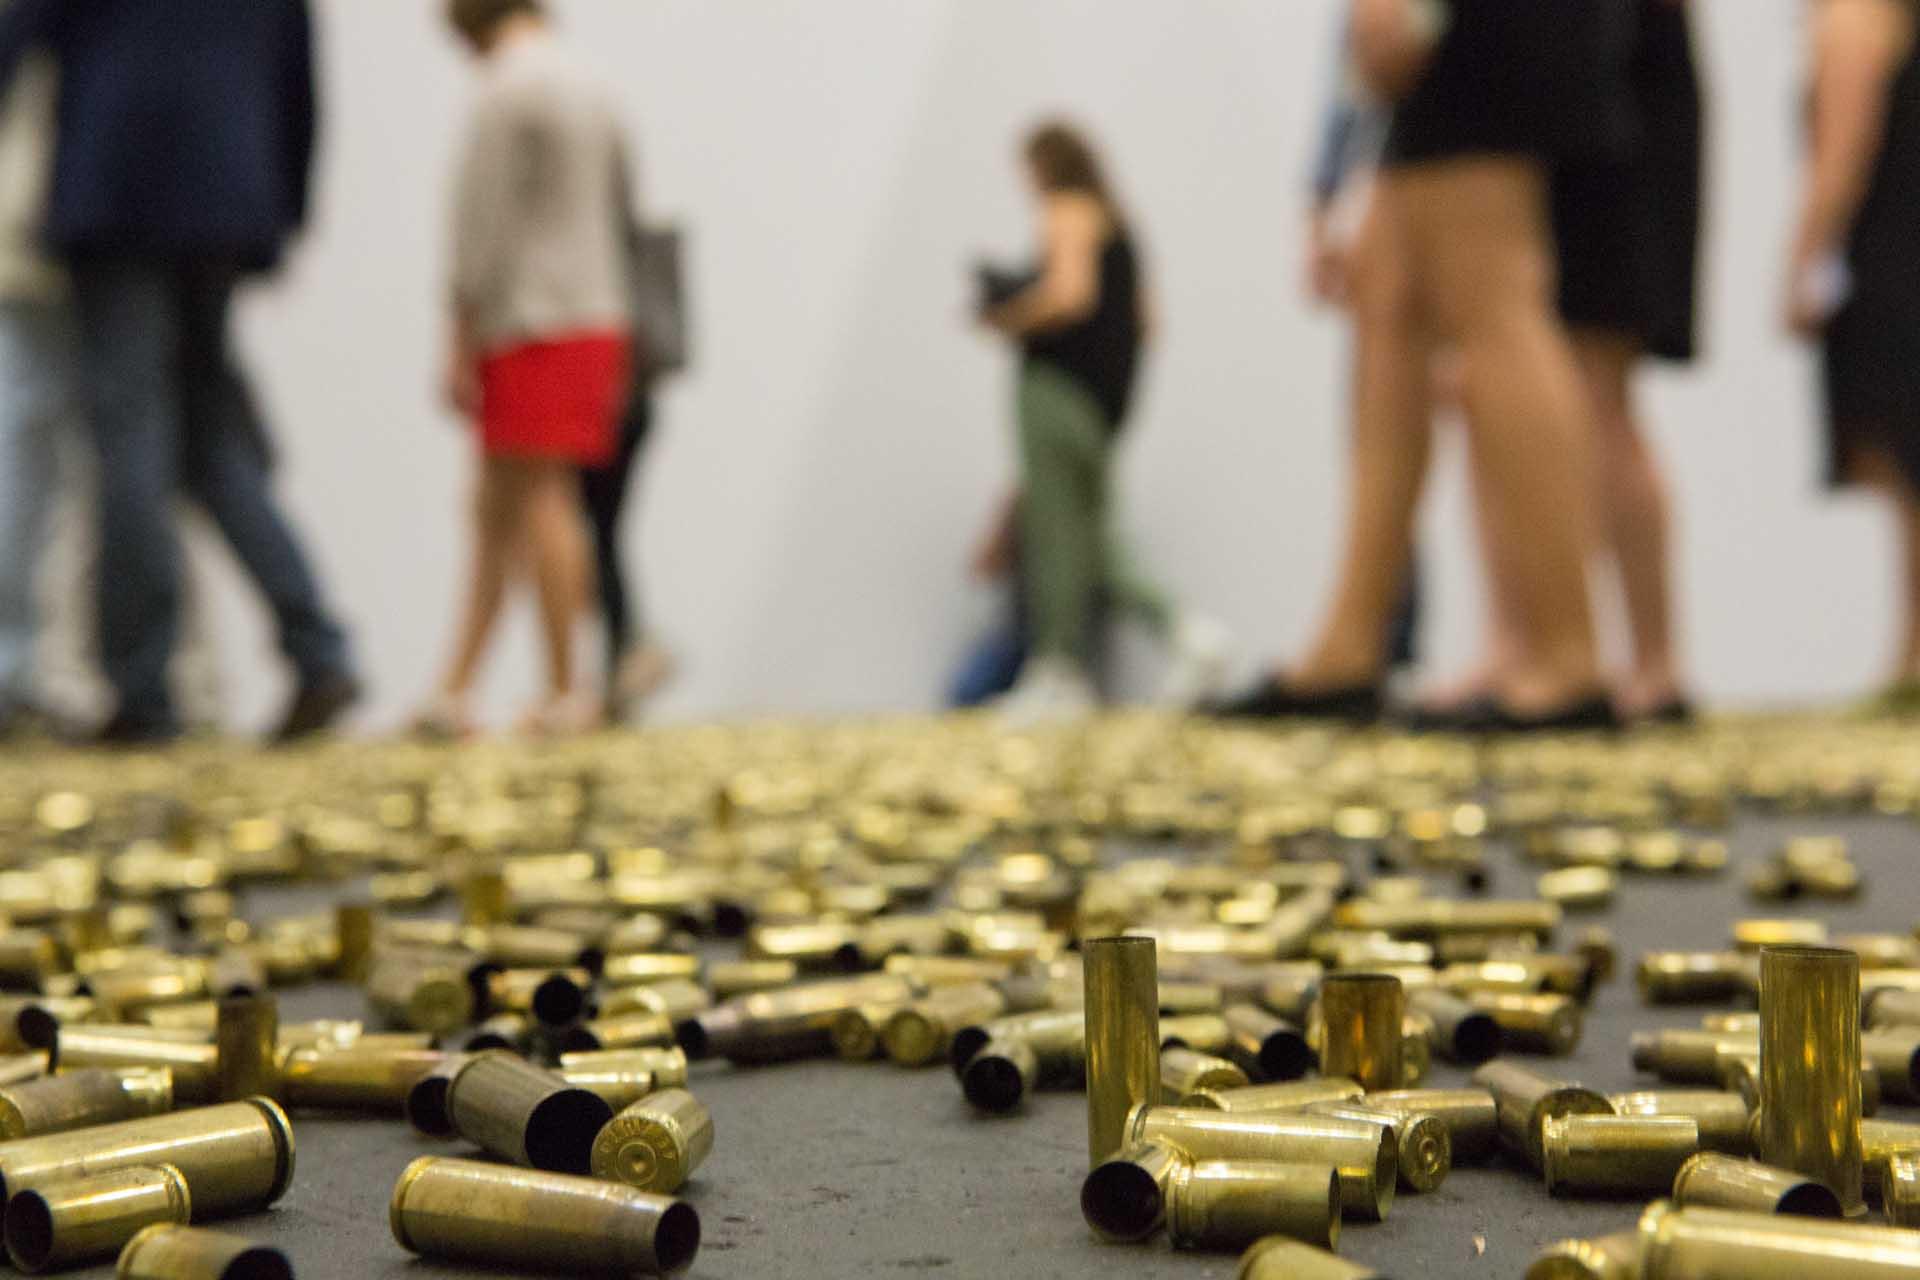 "Art Unlimited 2014: An installation by Matias Faldbakken, ""20.000 Gun Shells"", 2011 -  ""Reißzahn im Stoff"" Handelsblatt 20.06.2014"